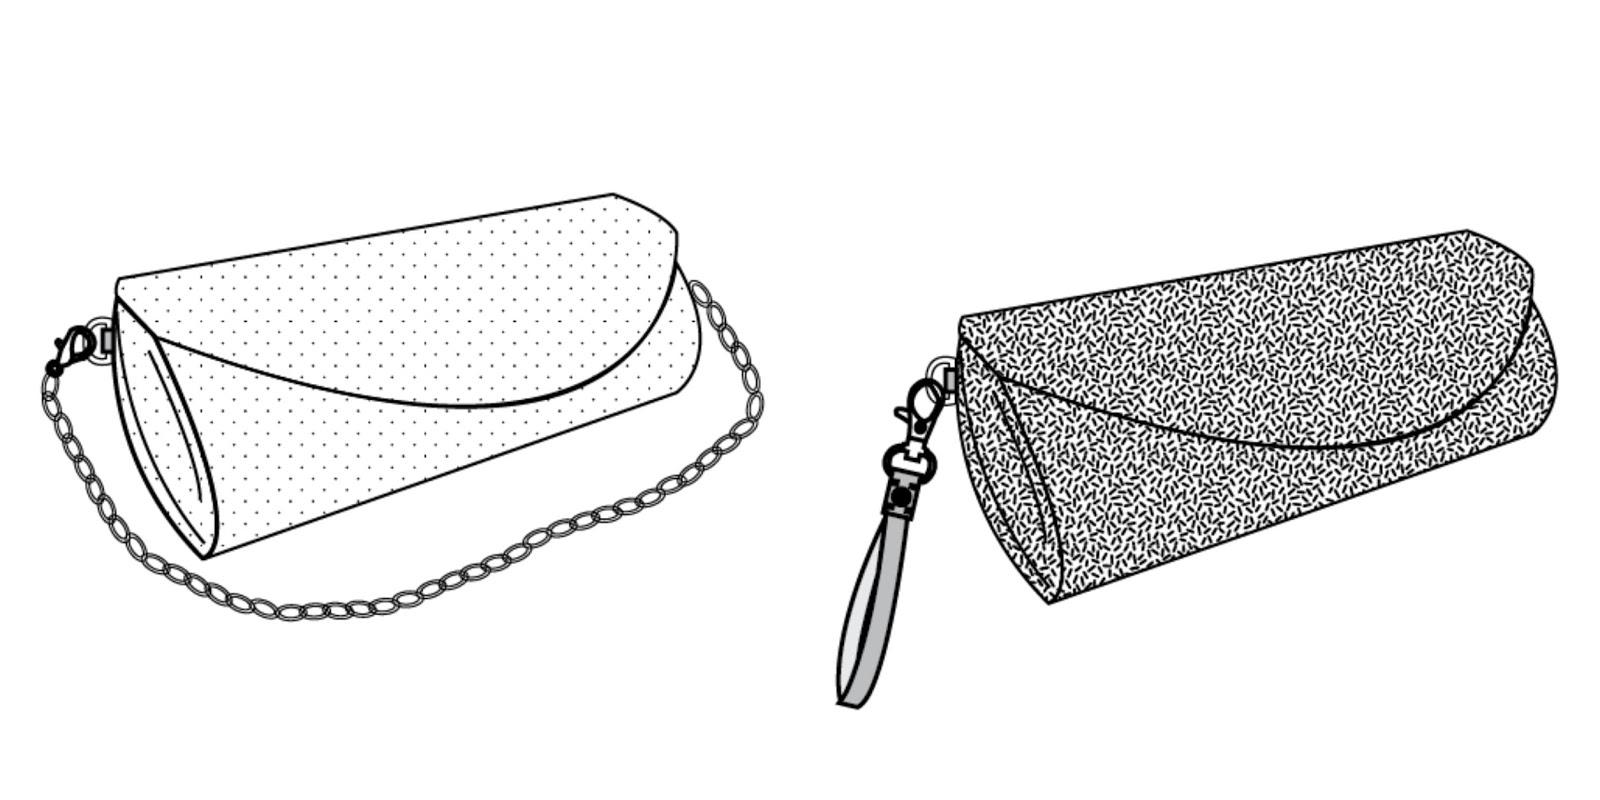 Toriska Bags & Crafts: Announcing...the Barrelette Clutch!